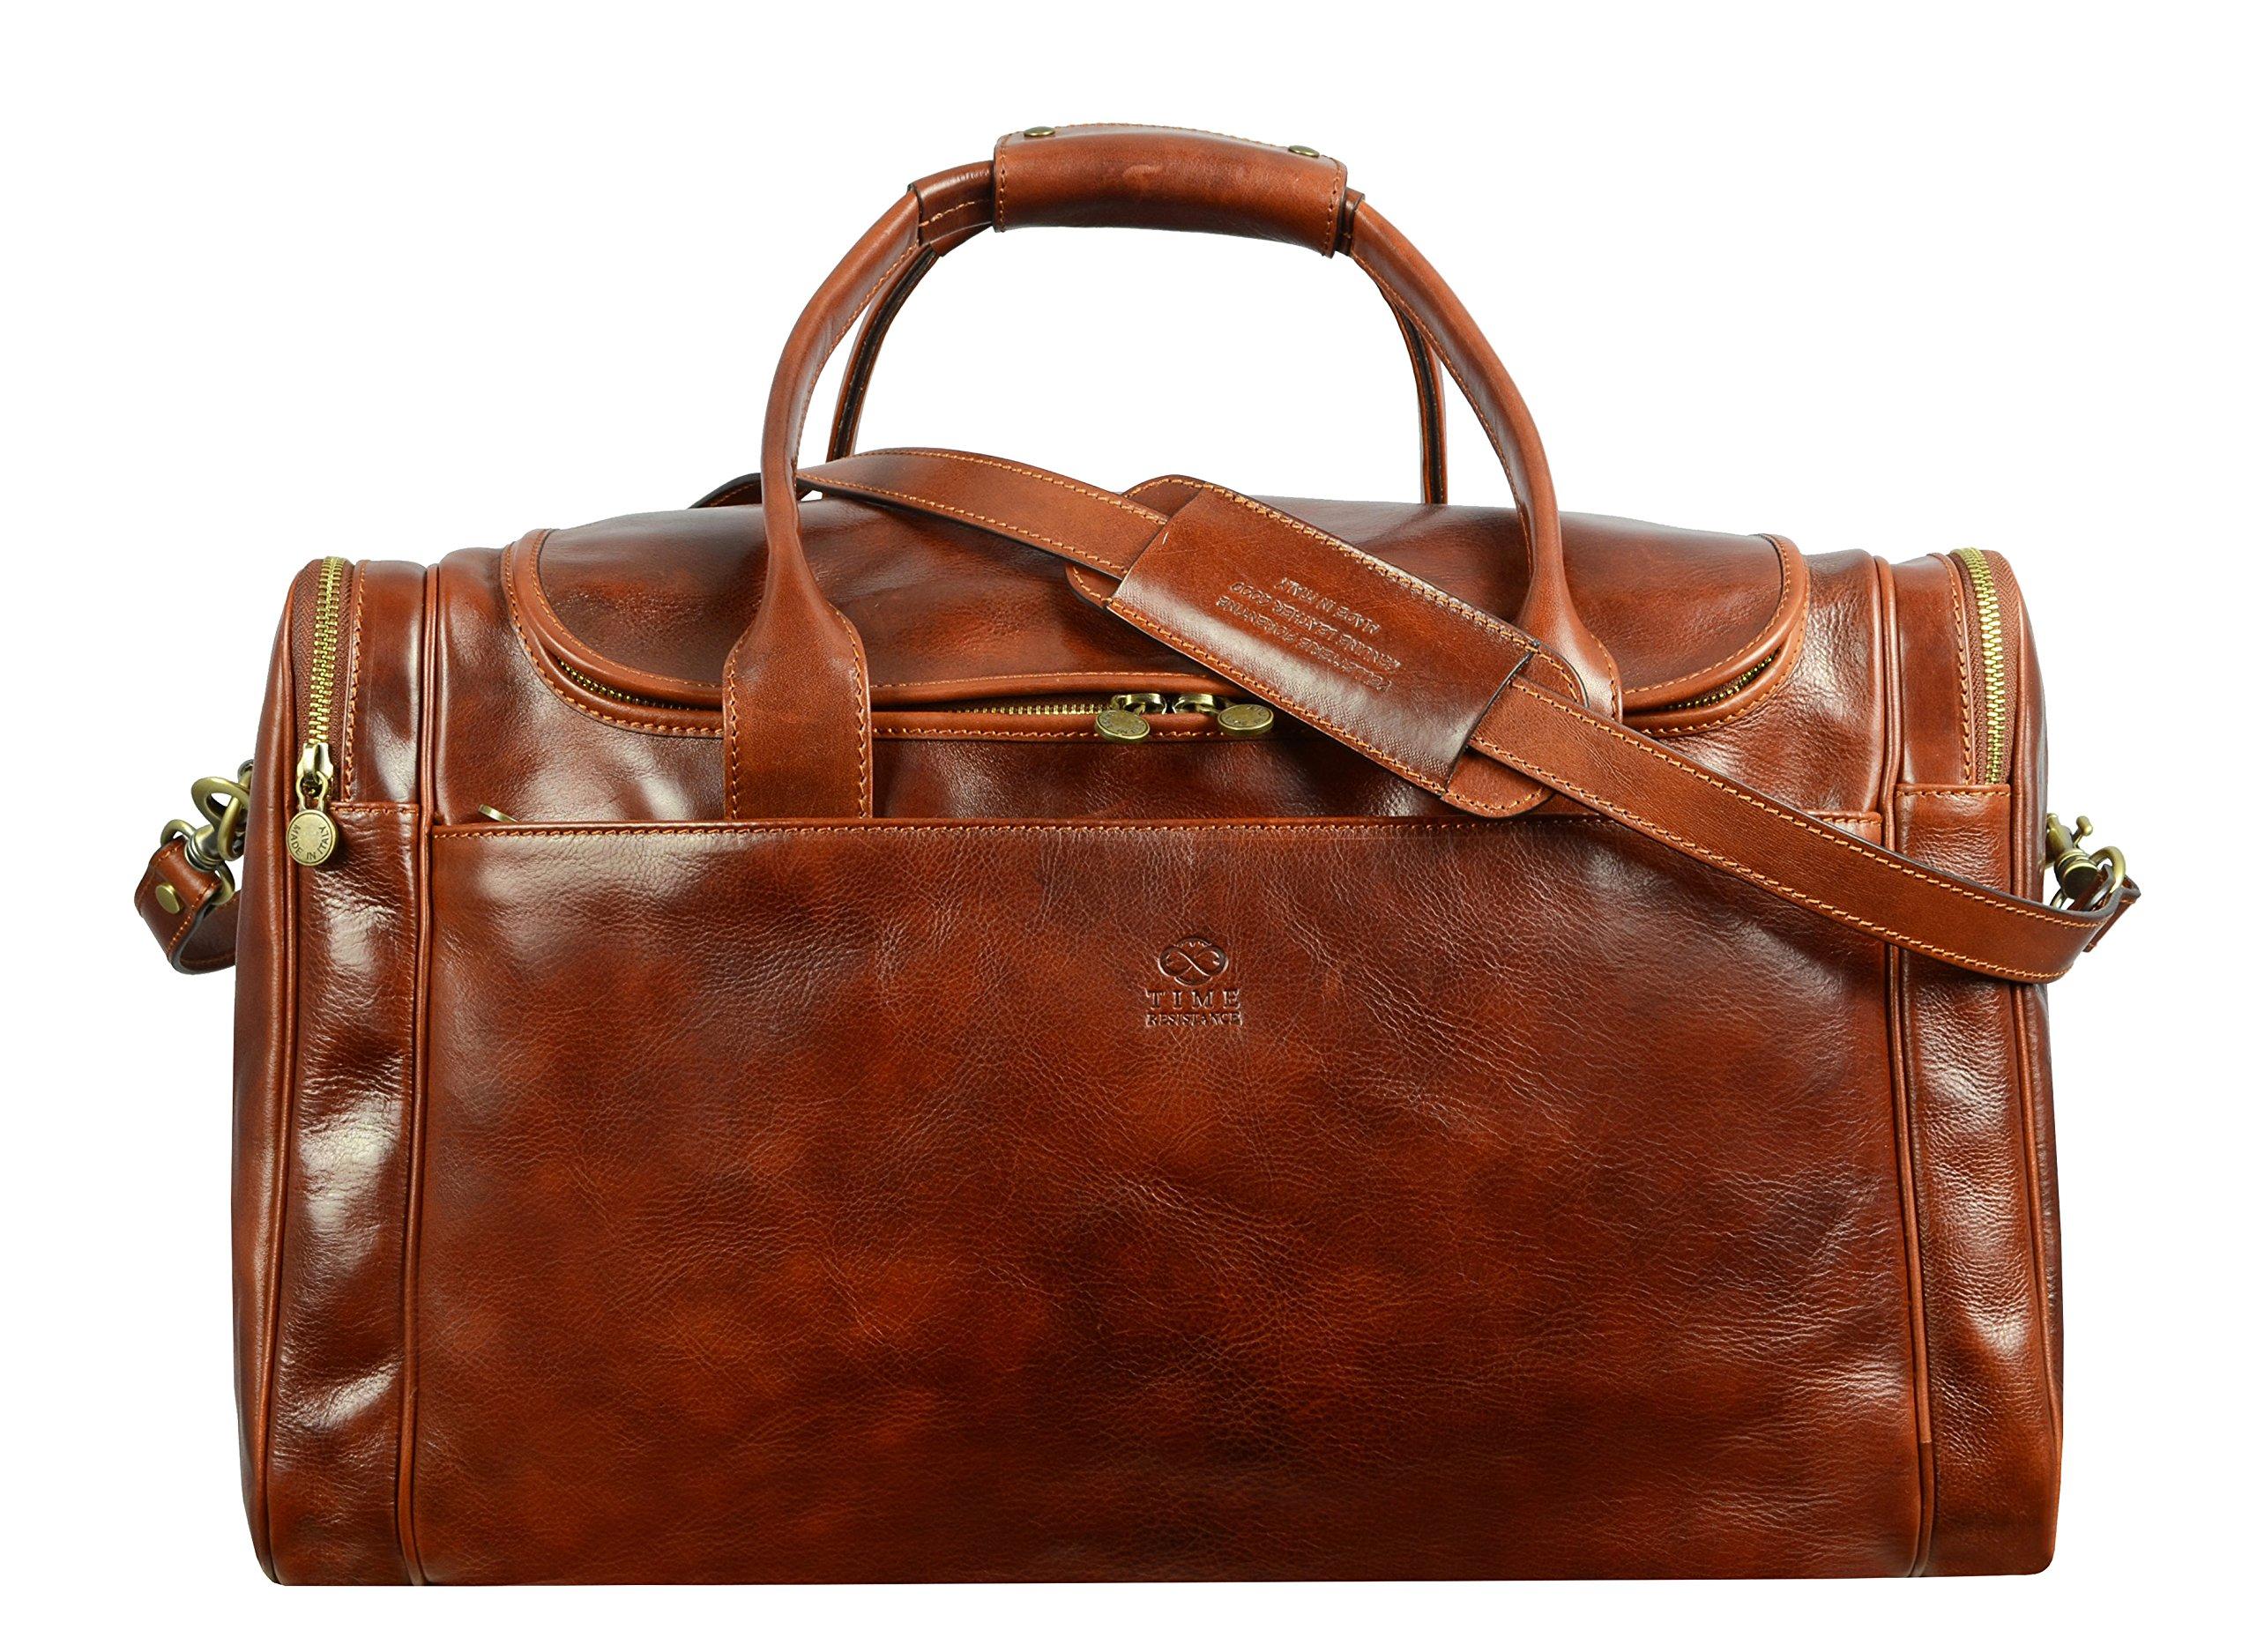 Leather Duffel Bag, Weekend Bag, Gym, Large Travel Bag, Cognac, Brown - Time Resistance by Time Resistance (Image #1)